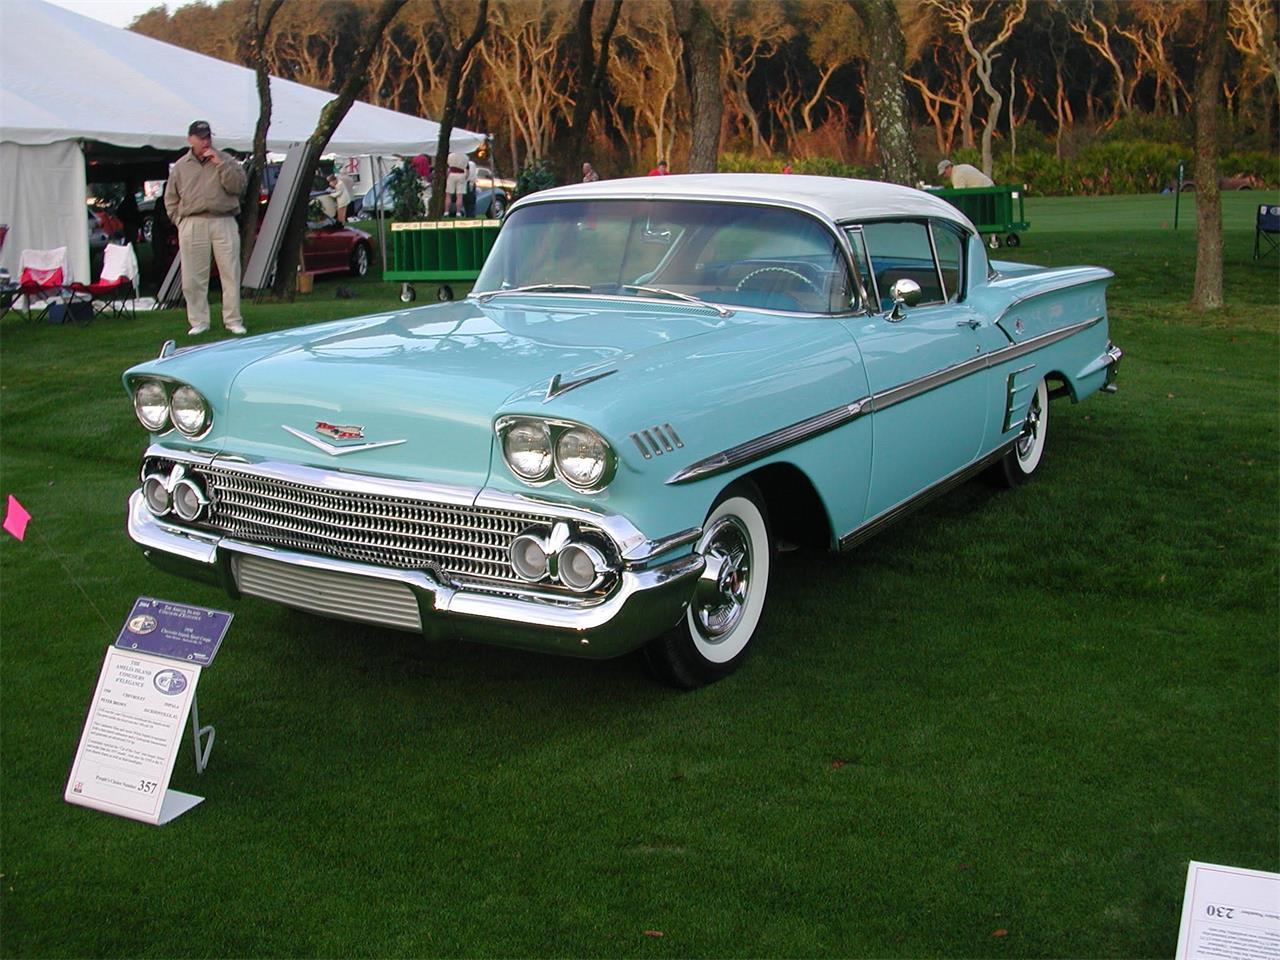 Kelebihan Kekurangan Chevrolet Bel Air 1958 Review